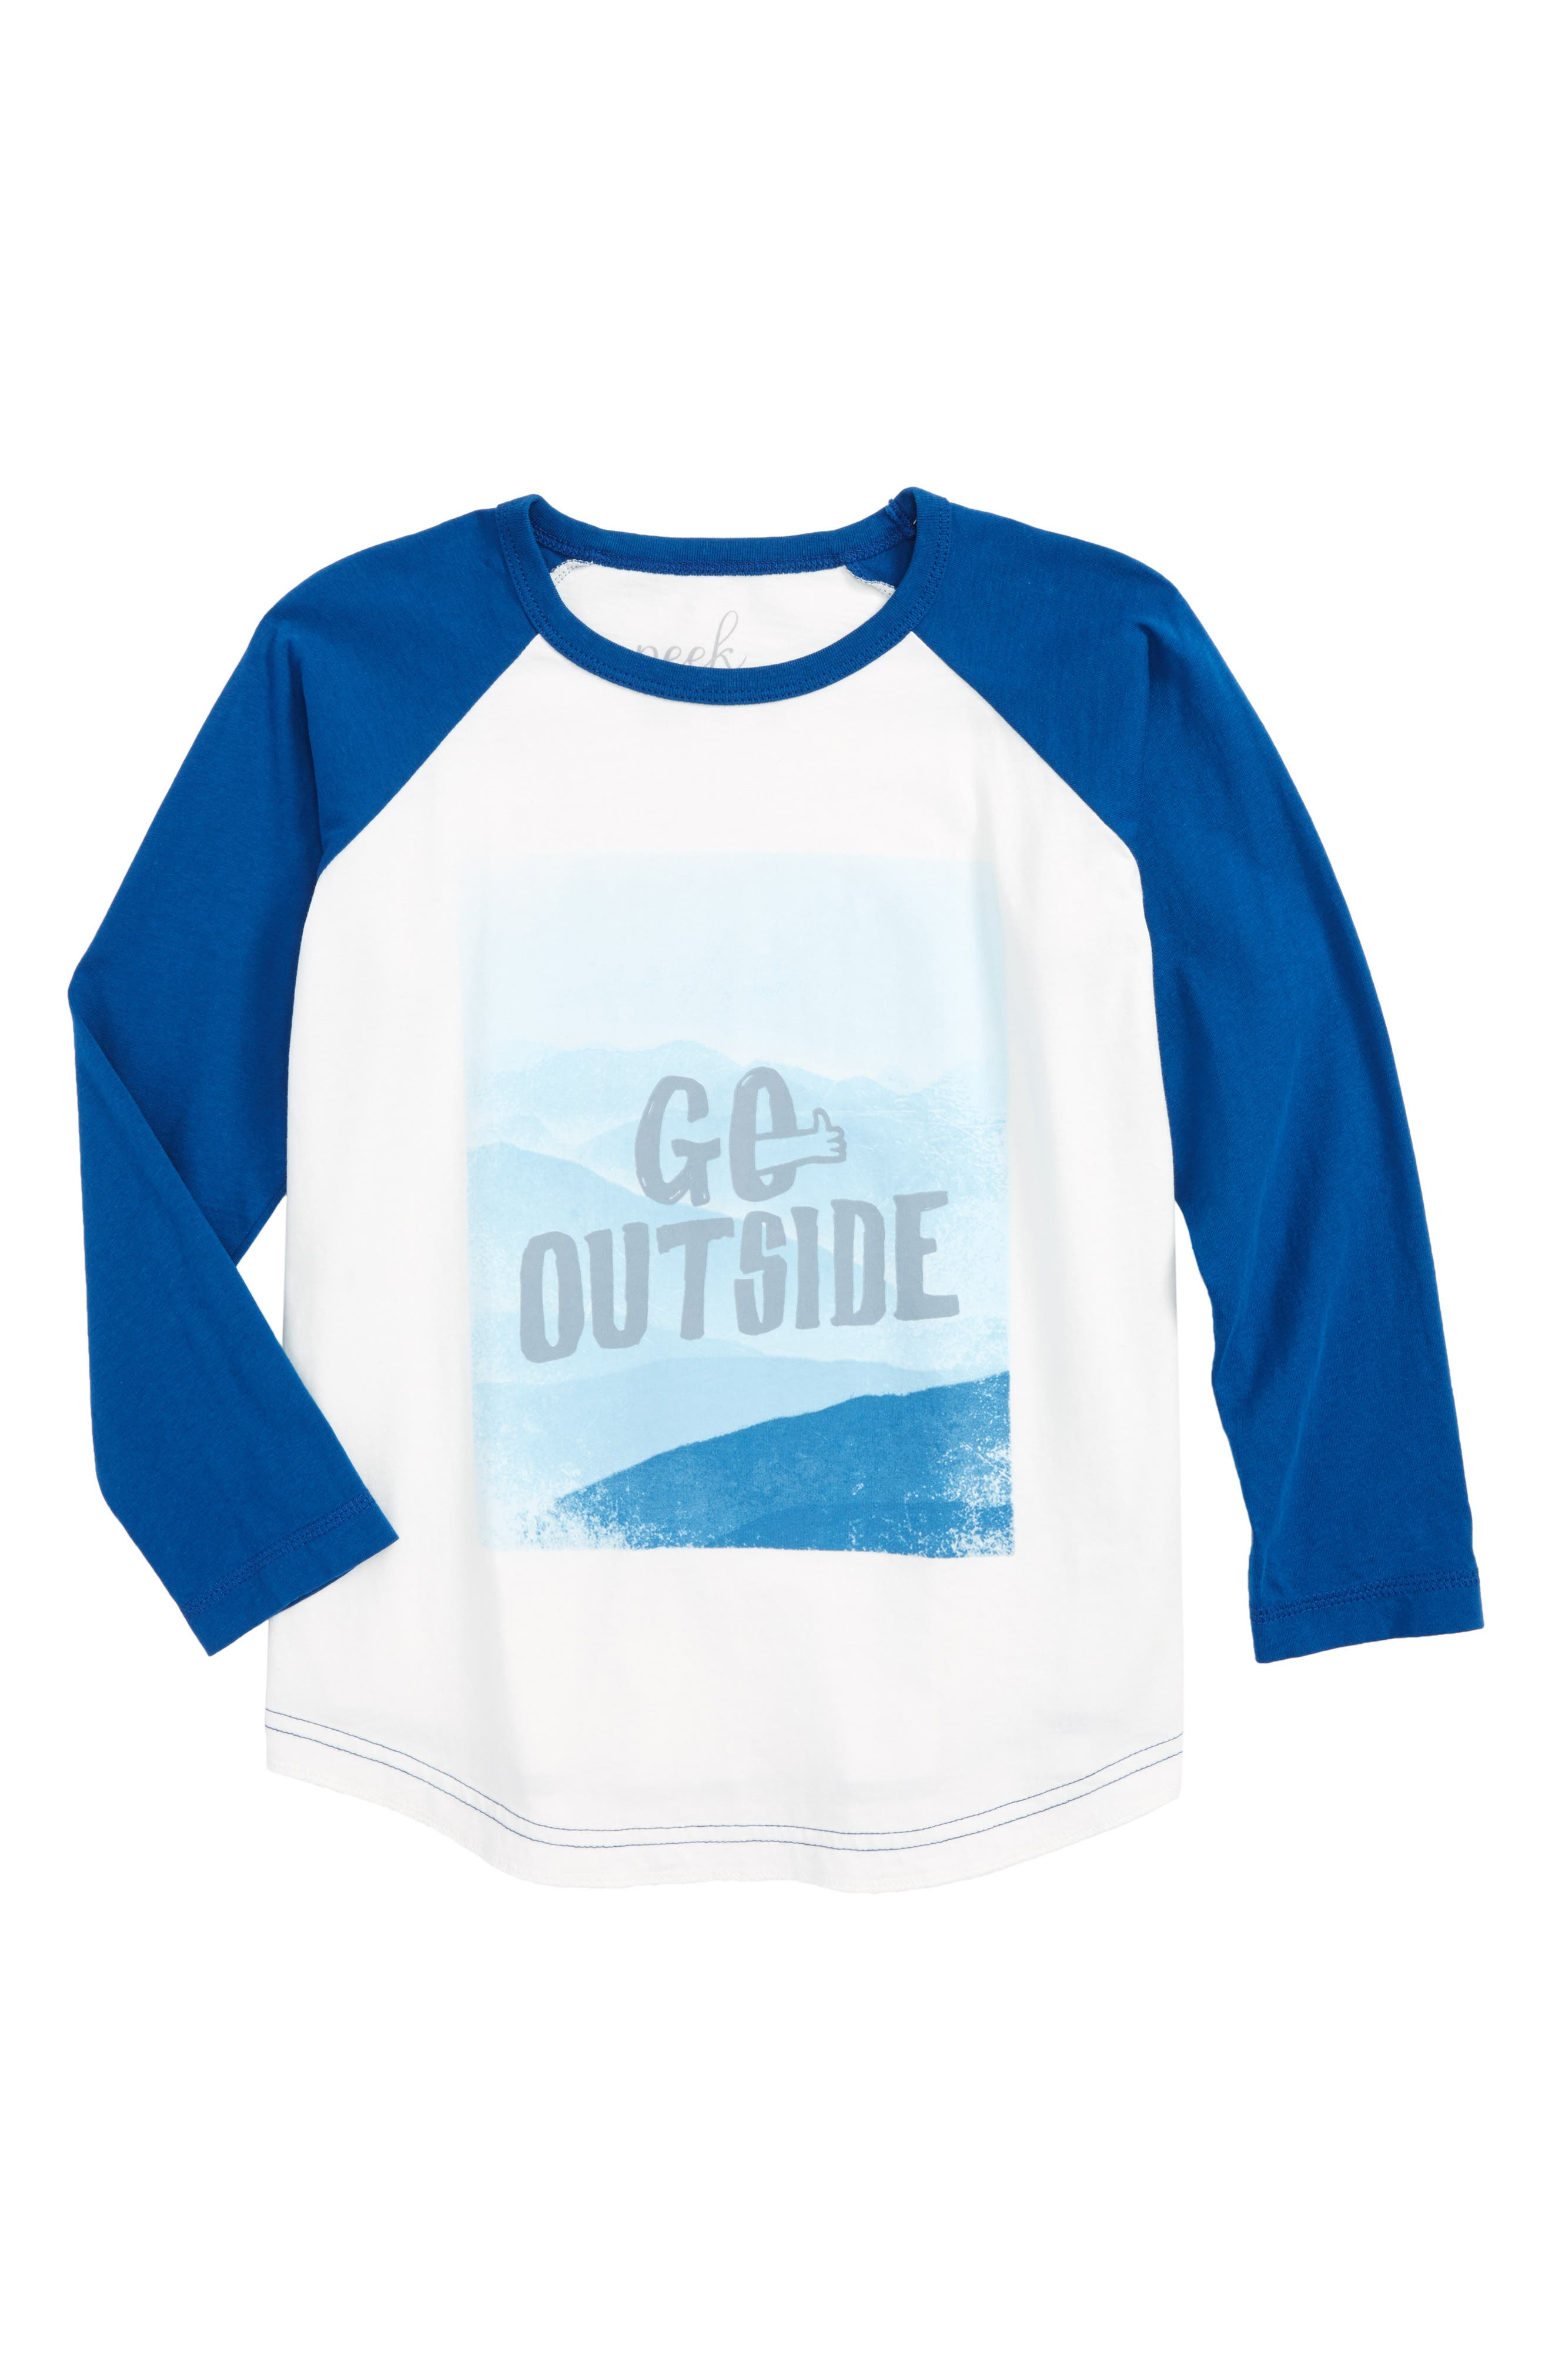 Main Image - Peek Go Outside Graphic Long Sleeve T-Shirt (Toddler Boys, Little Boys & Big Boys)